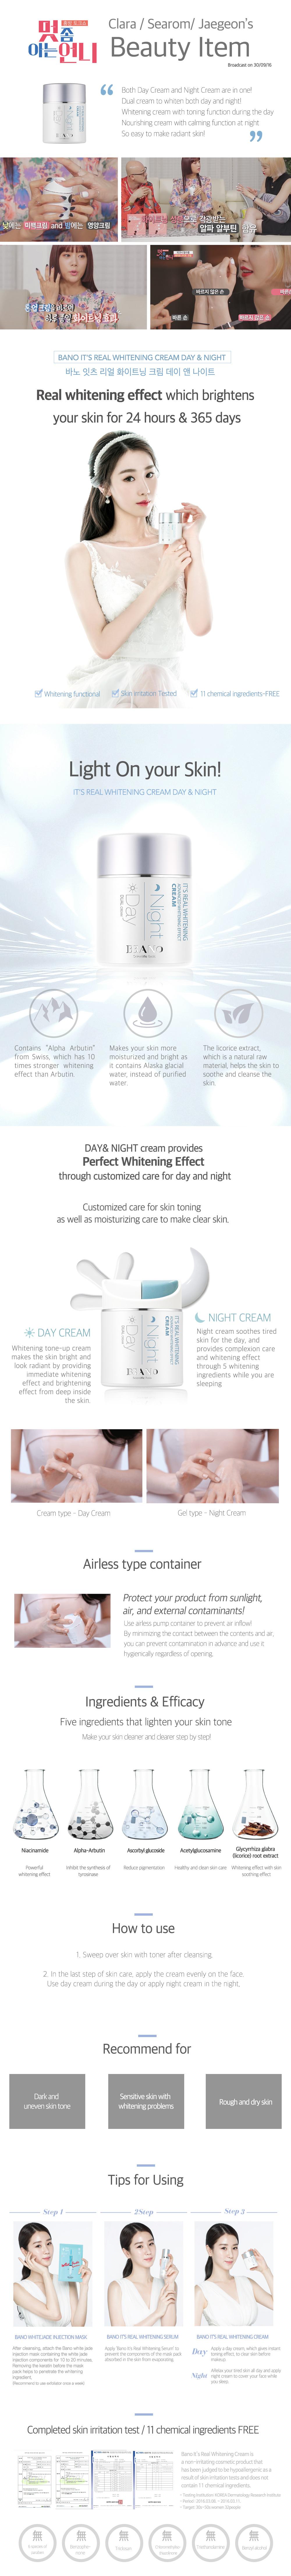 Its Real Whitening Cream